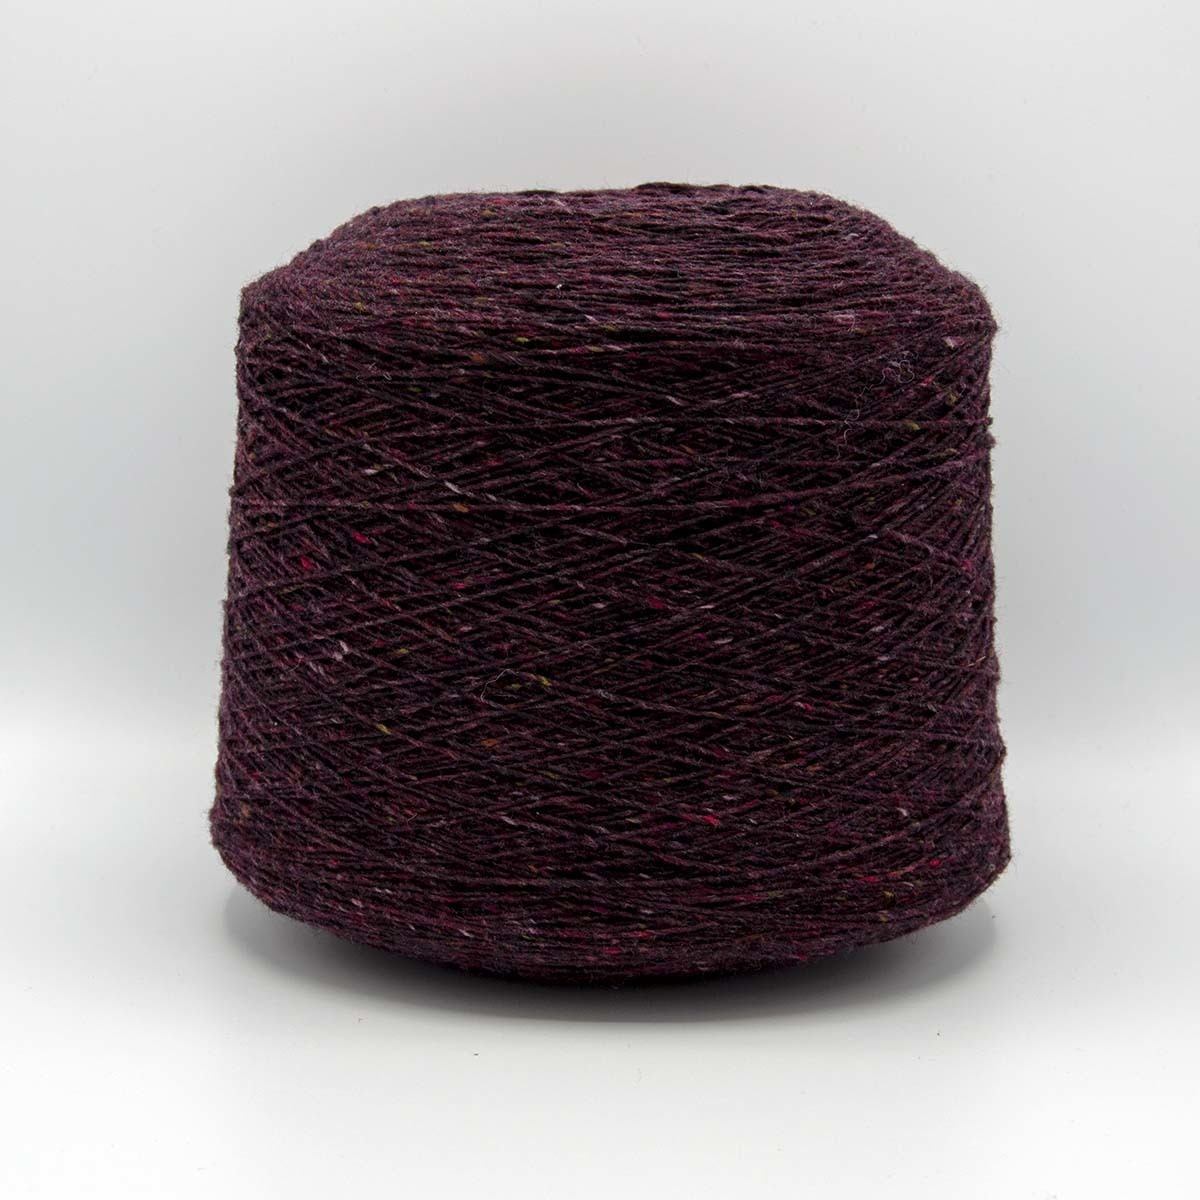 Knoll Yarns Soft Donegal (одинарный твид) - 5516